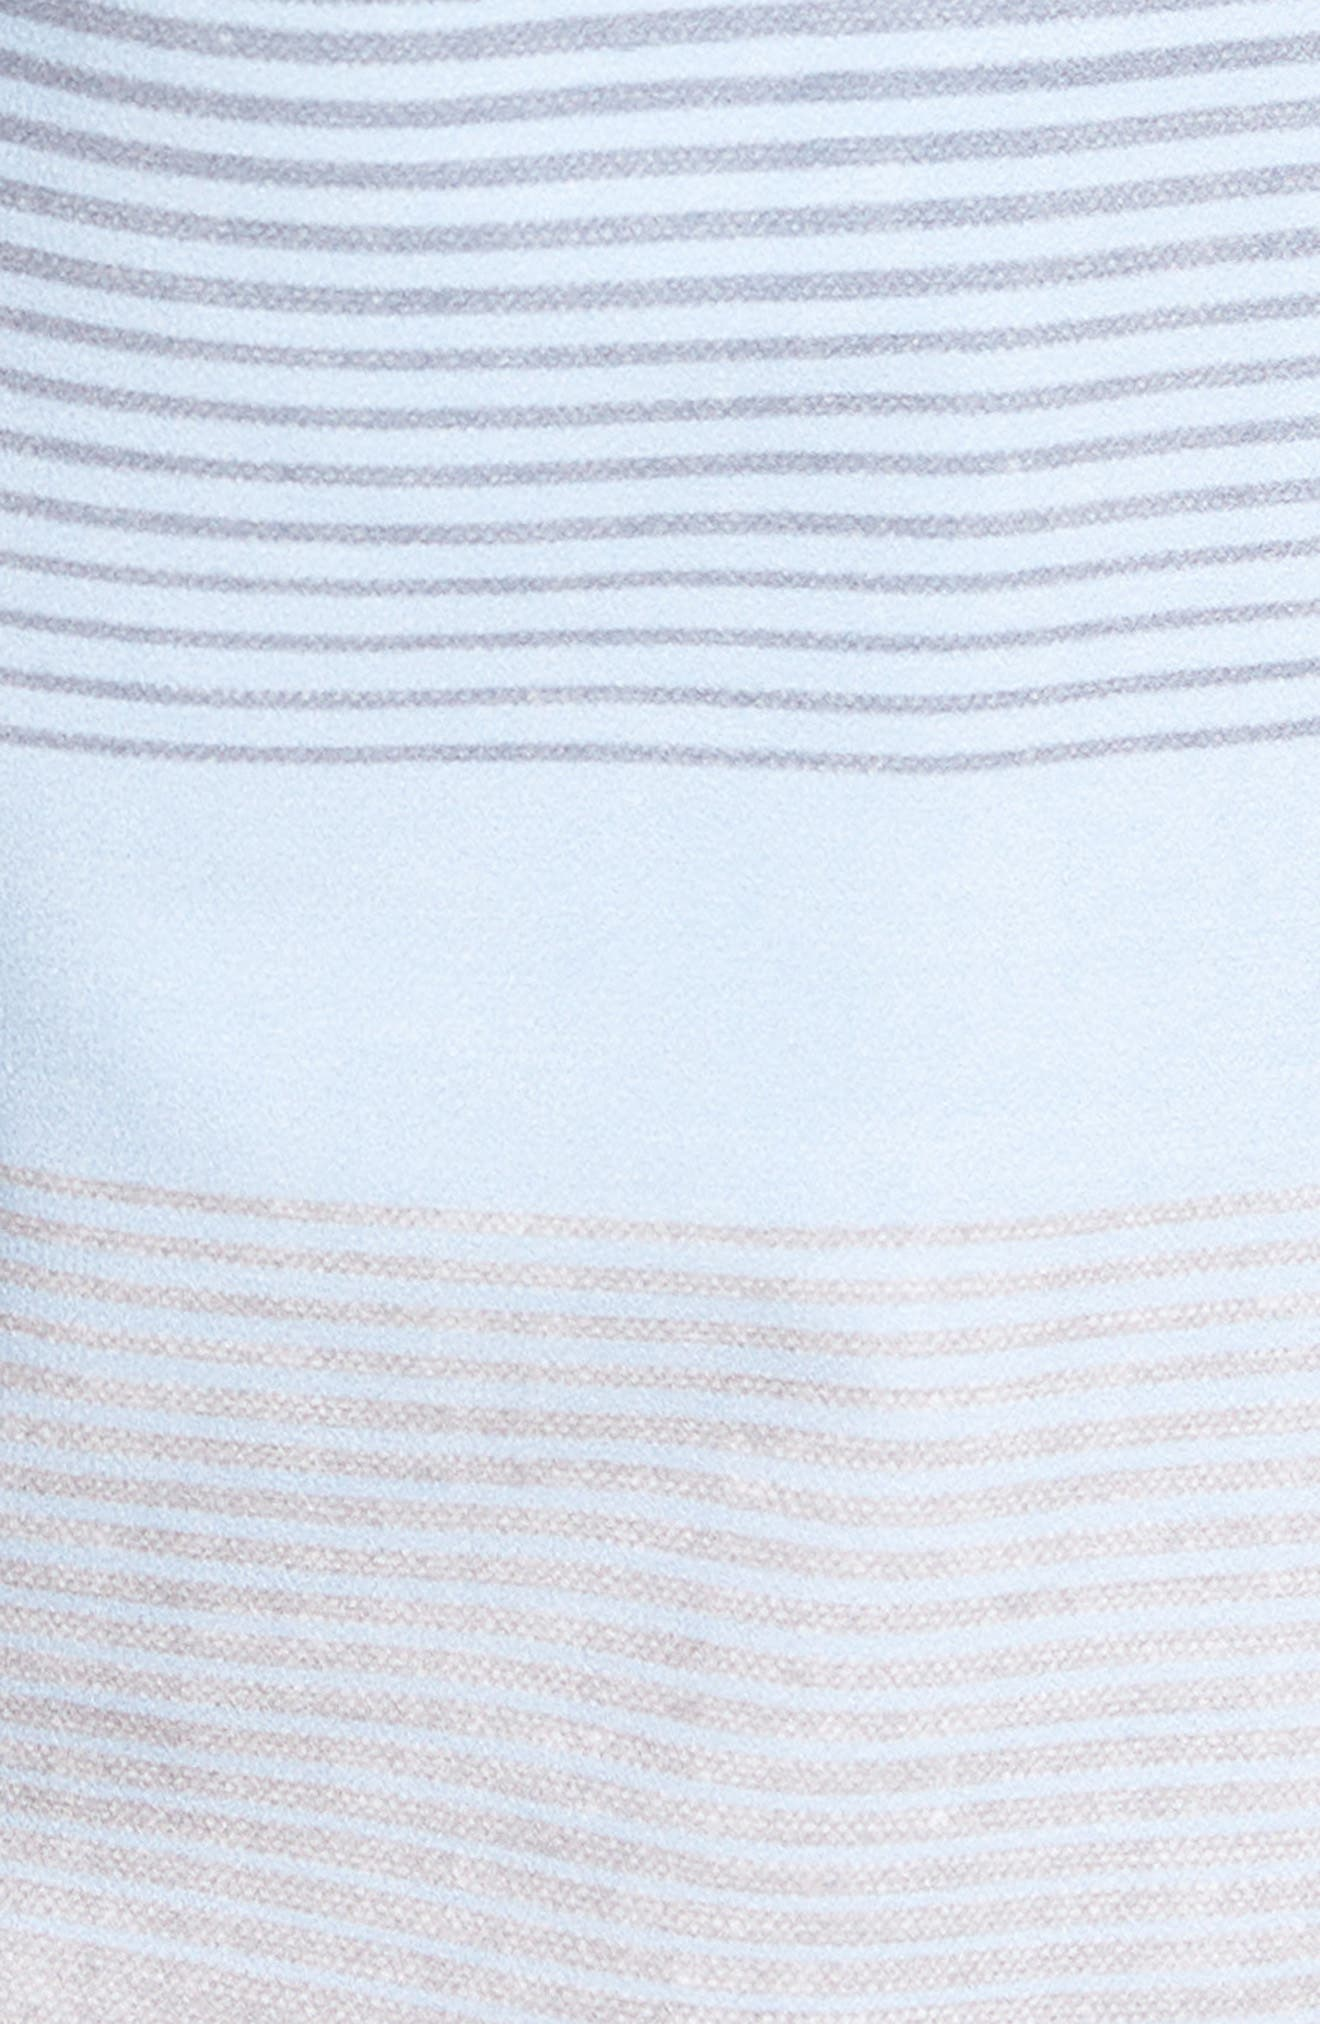 Seegrid Regular Fit Board Shorts,                             Alternate thumbnail 5, color,                             401